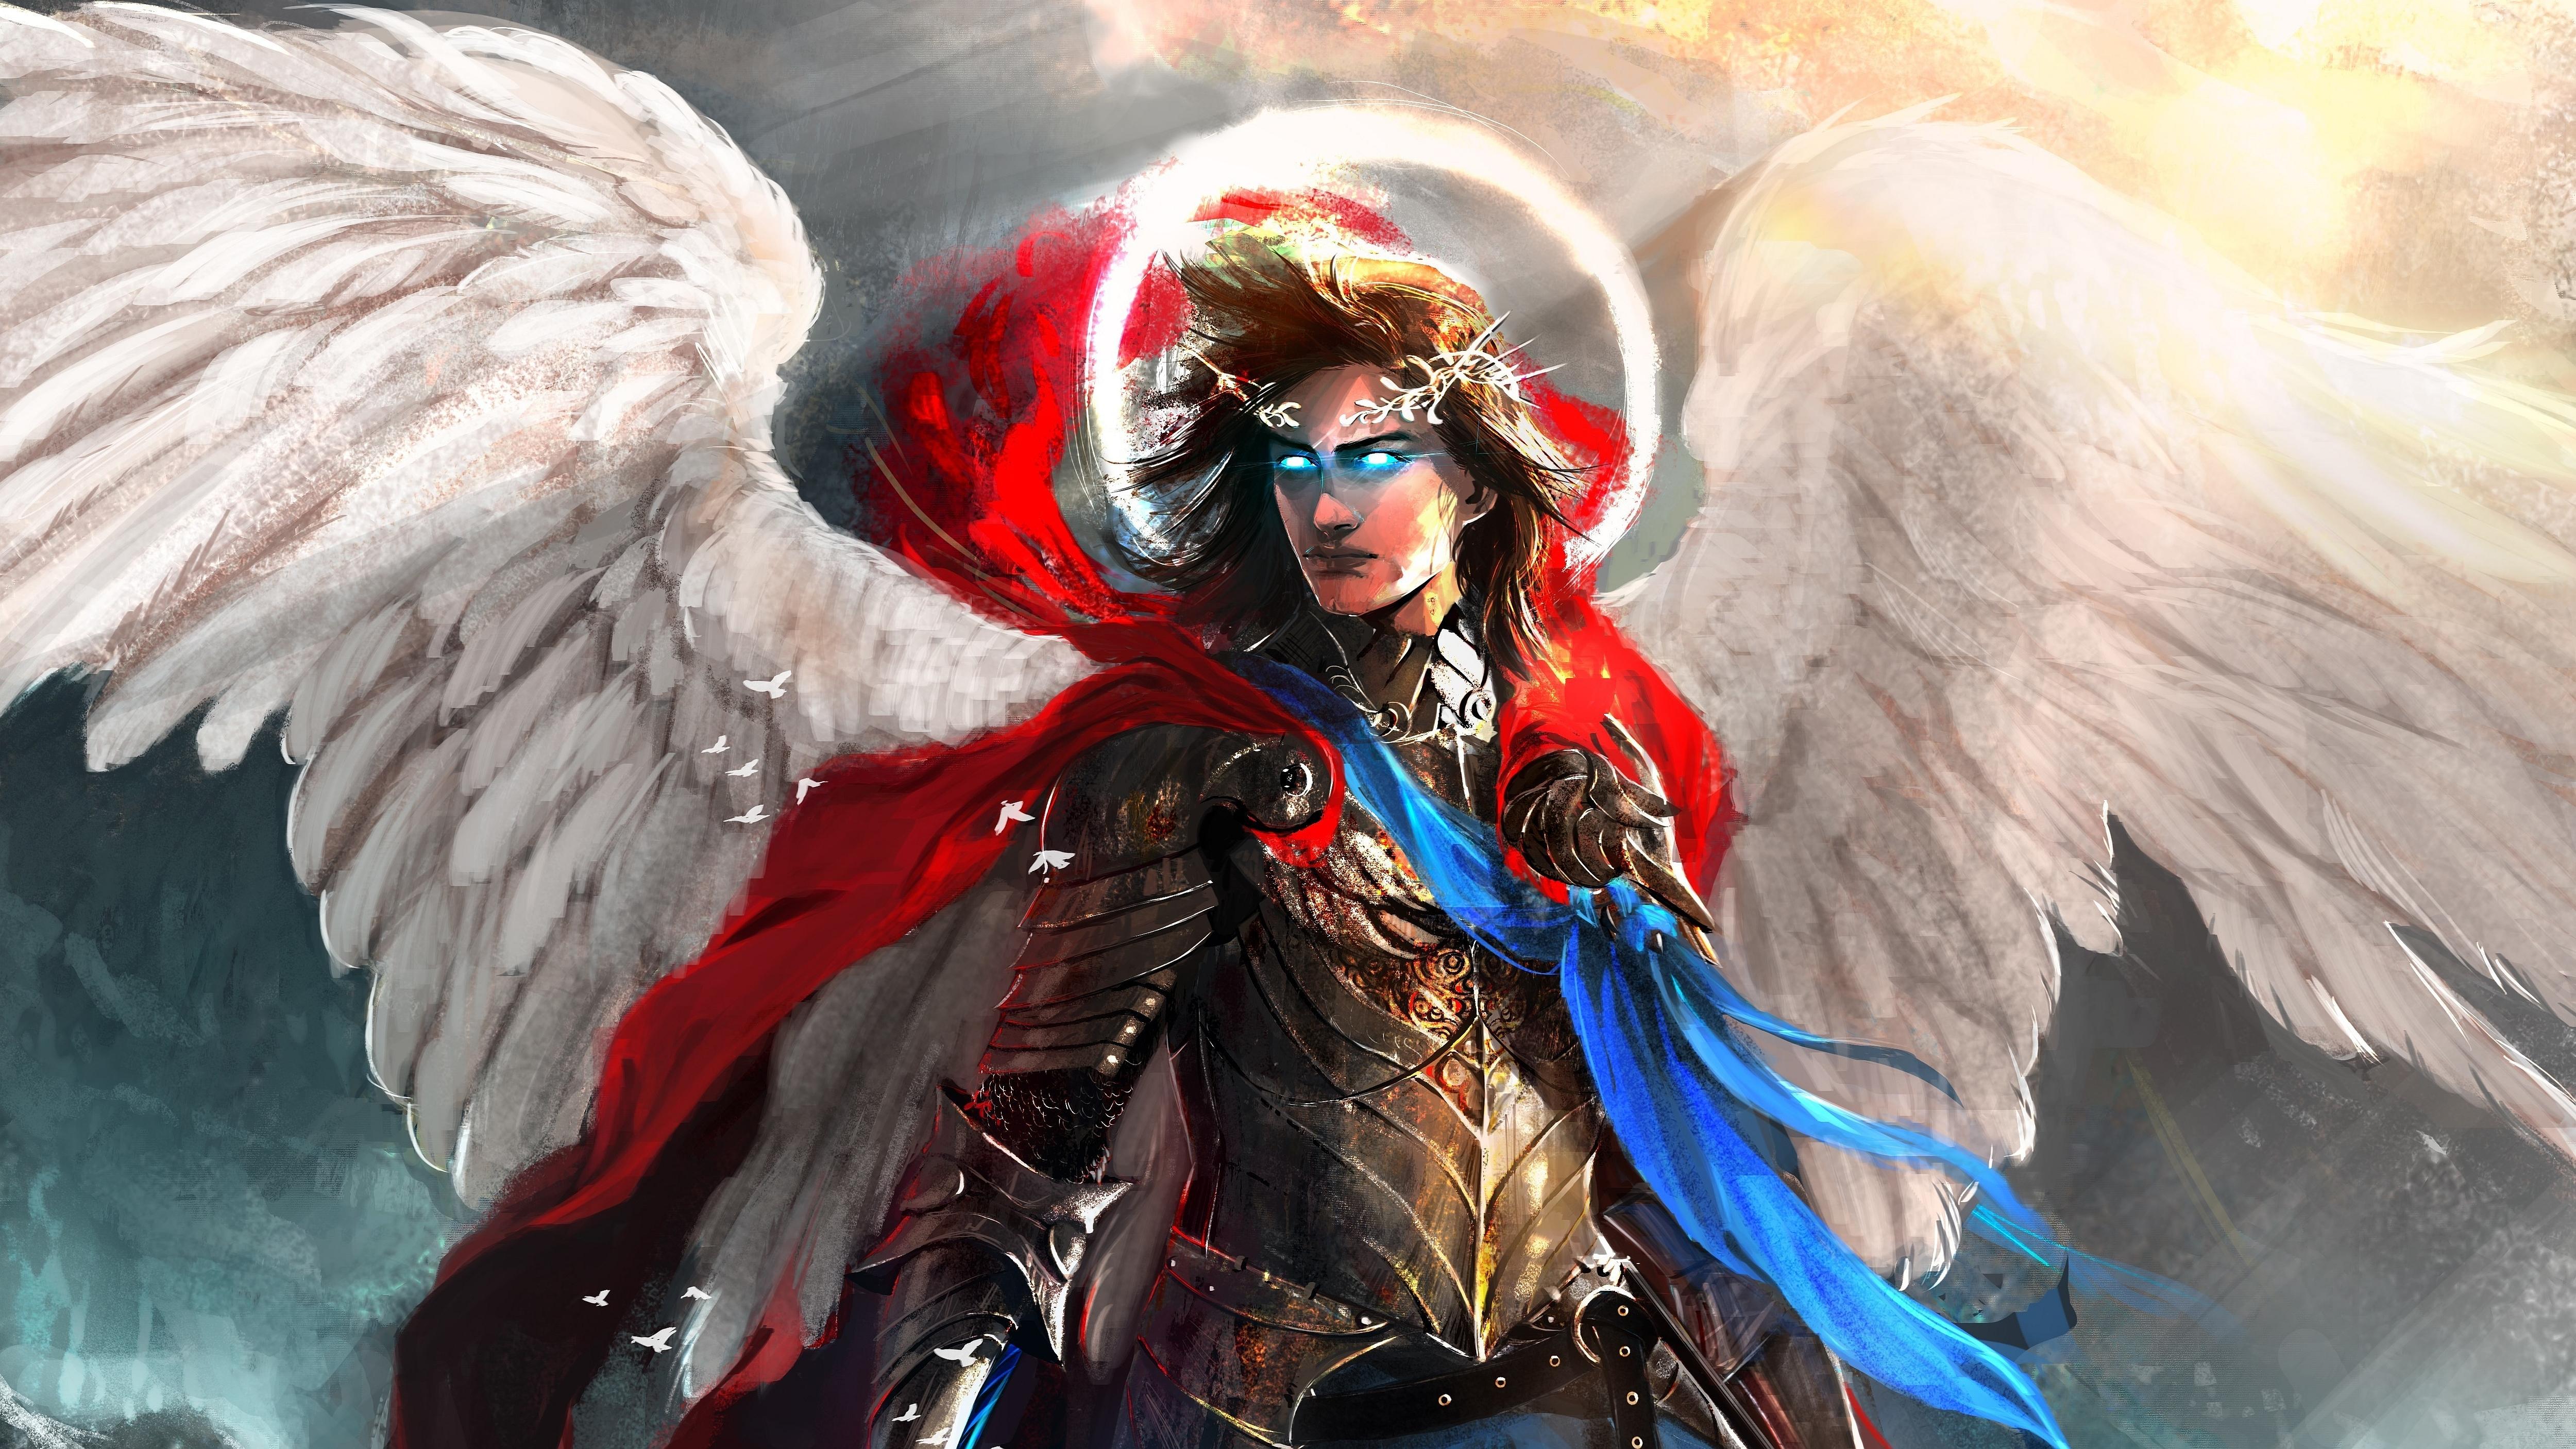 Warrior Fantasy Art Armor Angel Magic Wallpapers Hd: Angel Warrior 4k Ultra HD Wallpaper